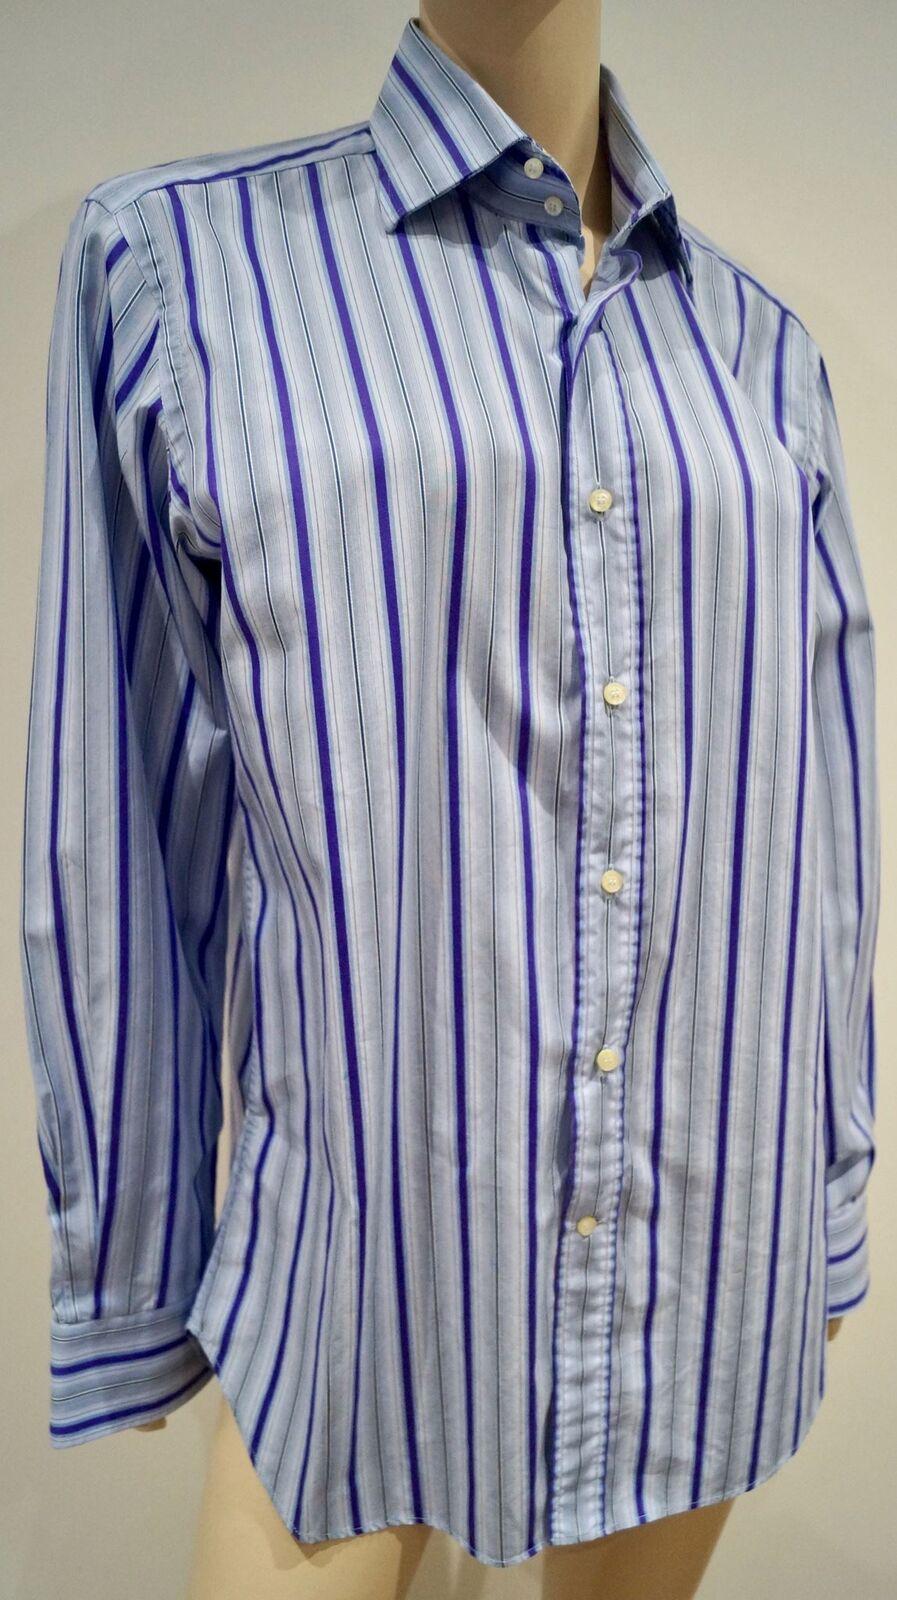 ETRO MILANO  Menswear bluee & Purple Striped Formal Dress Shirt Top Sz 41